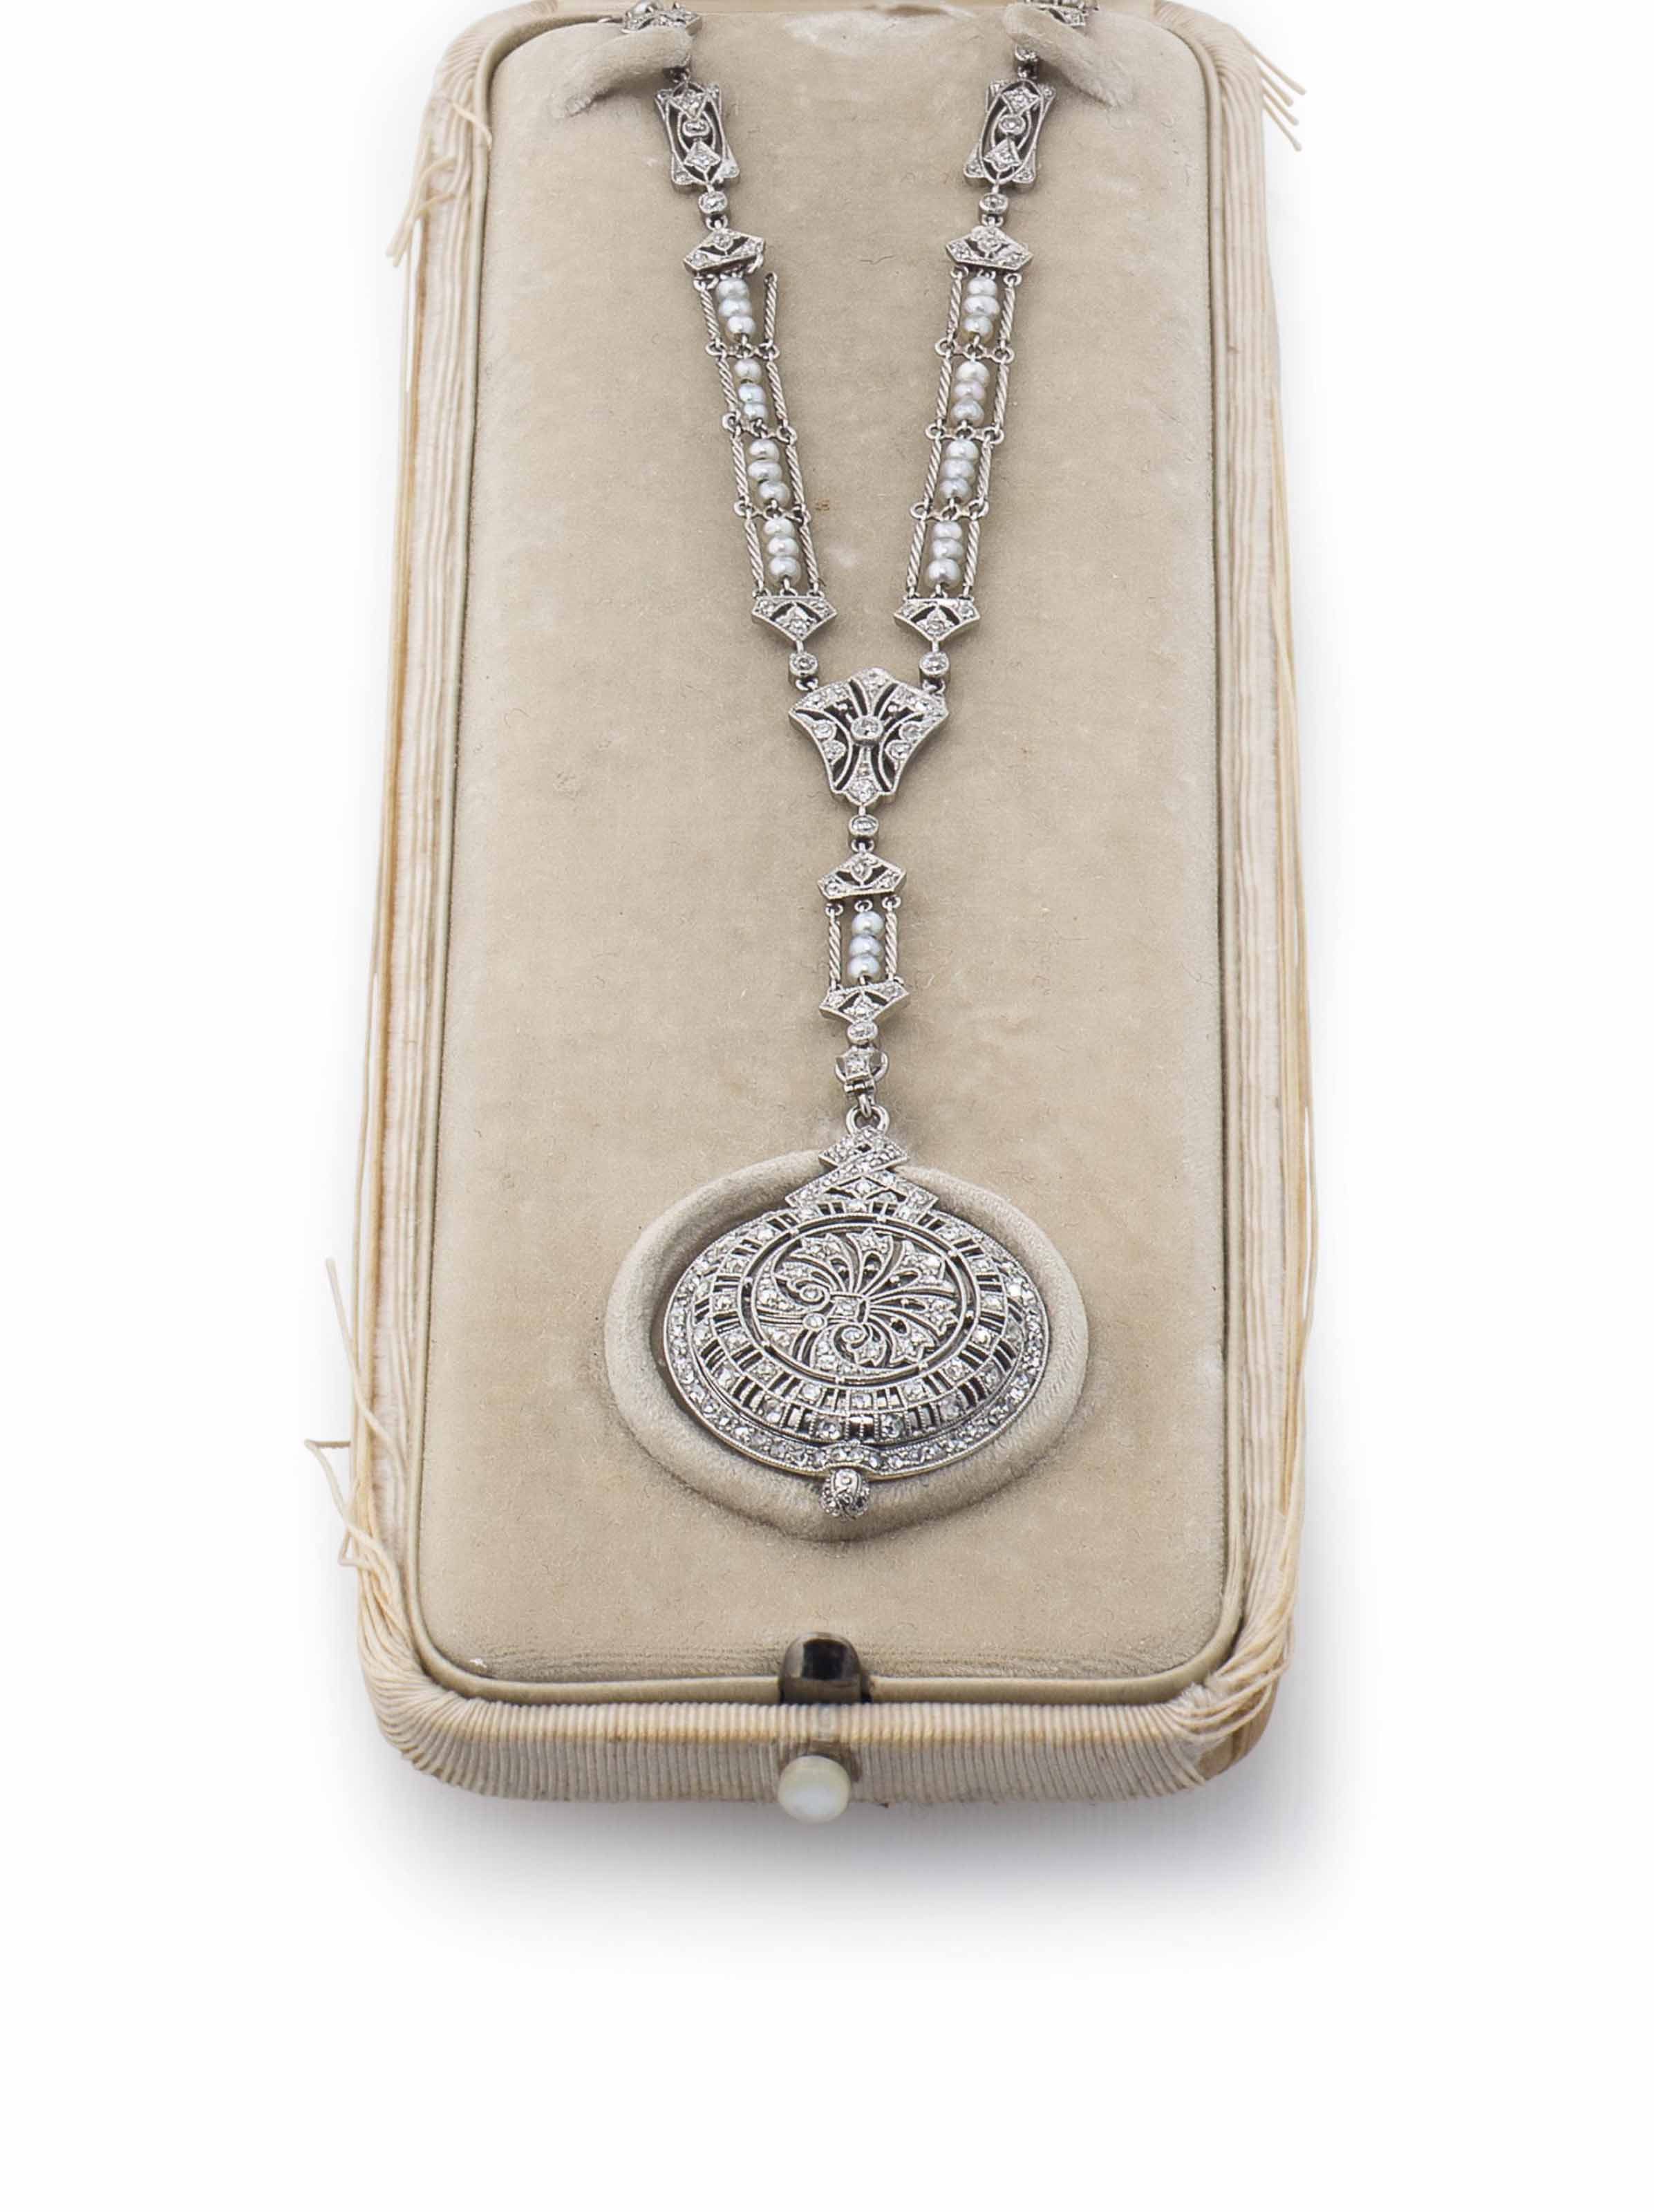 Meylan. A Fine Platinum, Diamond and Pearl-set Keyless Lever Pendant Watch with Chain